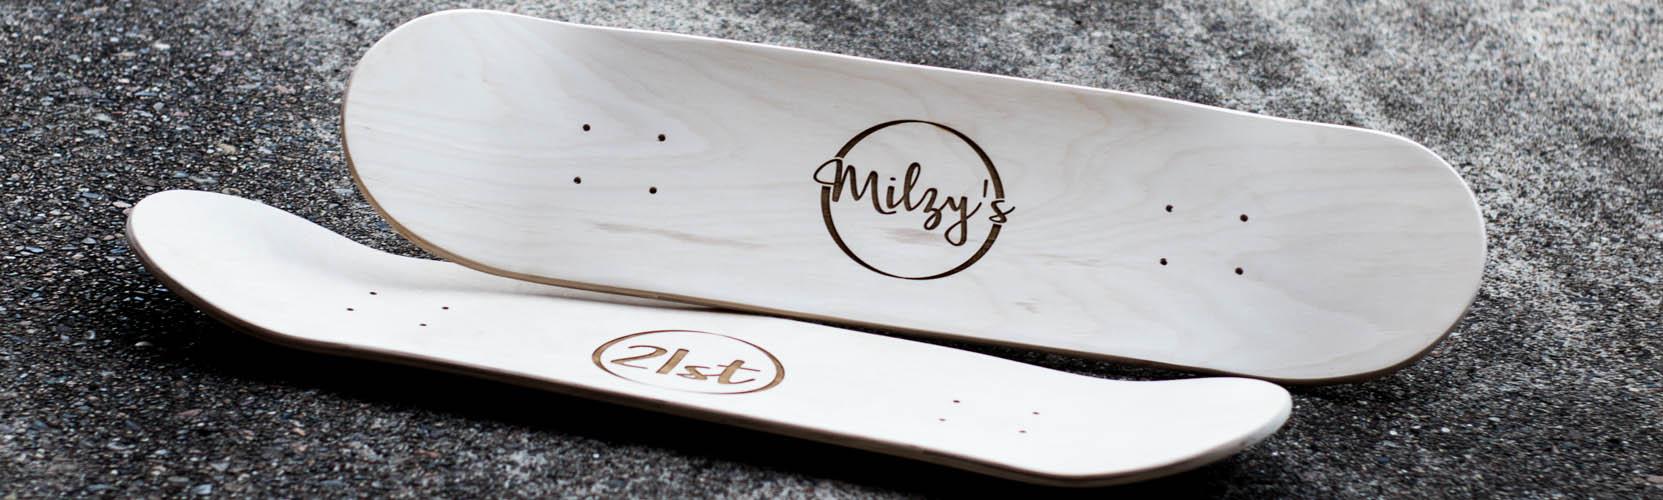 StudioT55-Engraved_Skateboard1-min